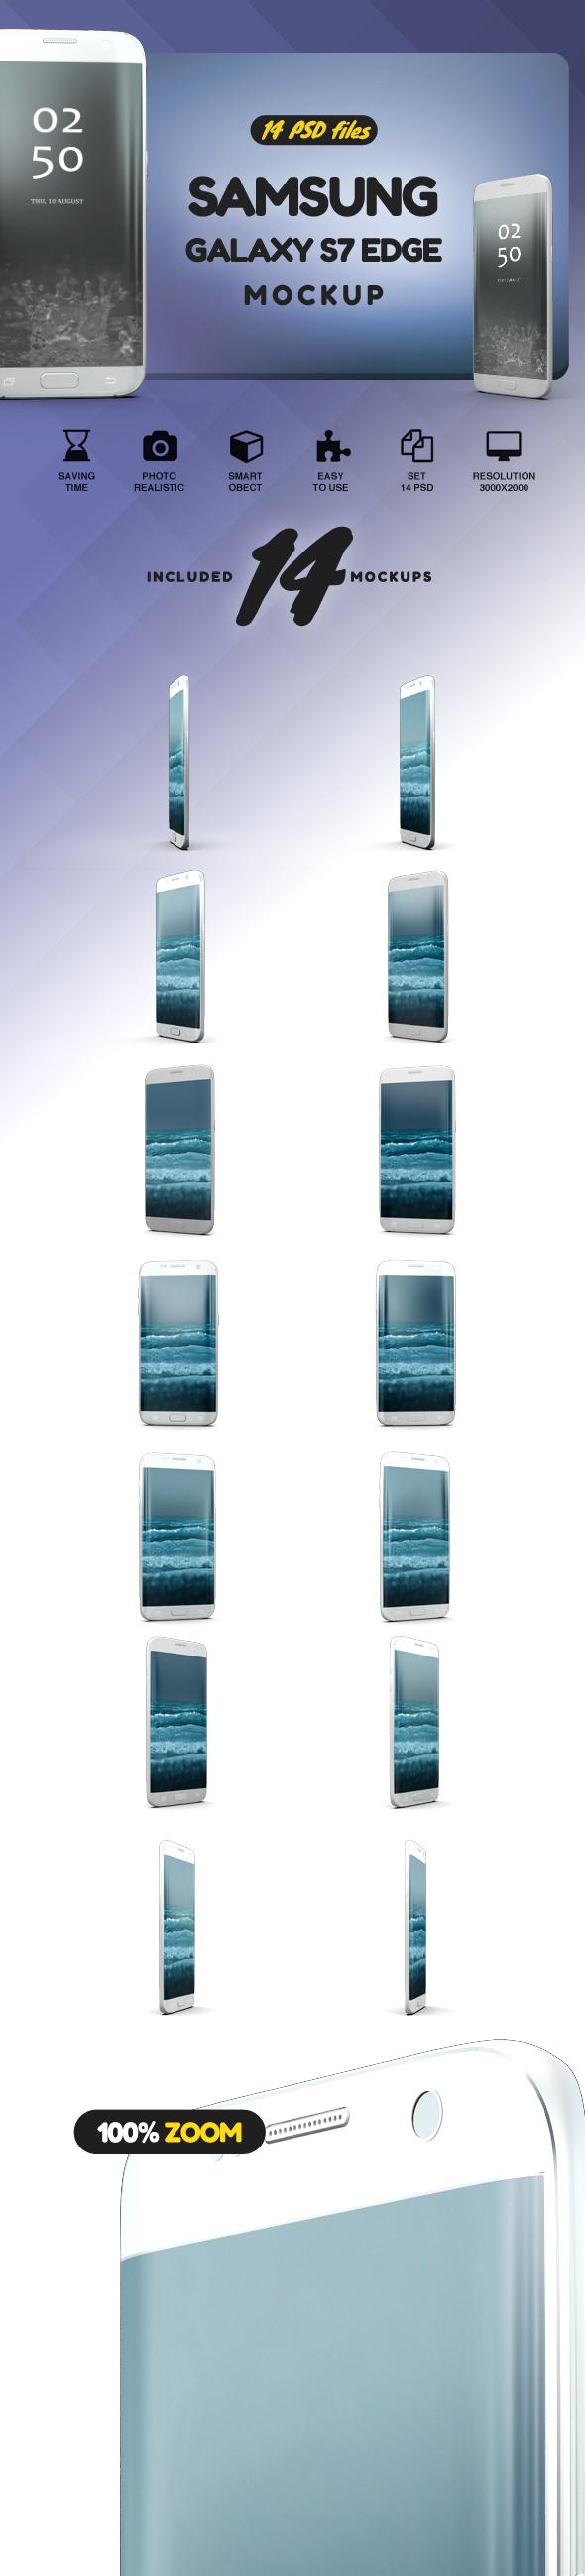 Samsung Galaxy S7 Edge Mockup example image 2